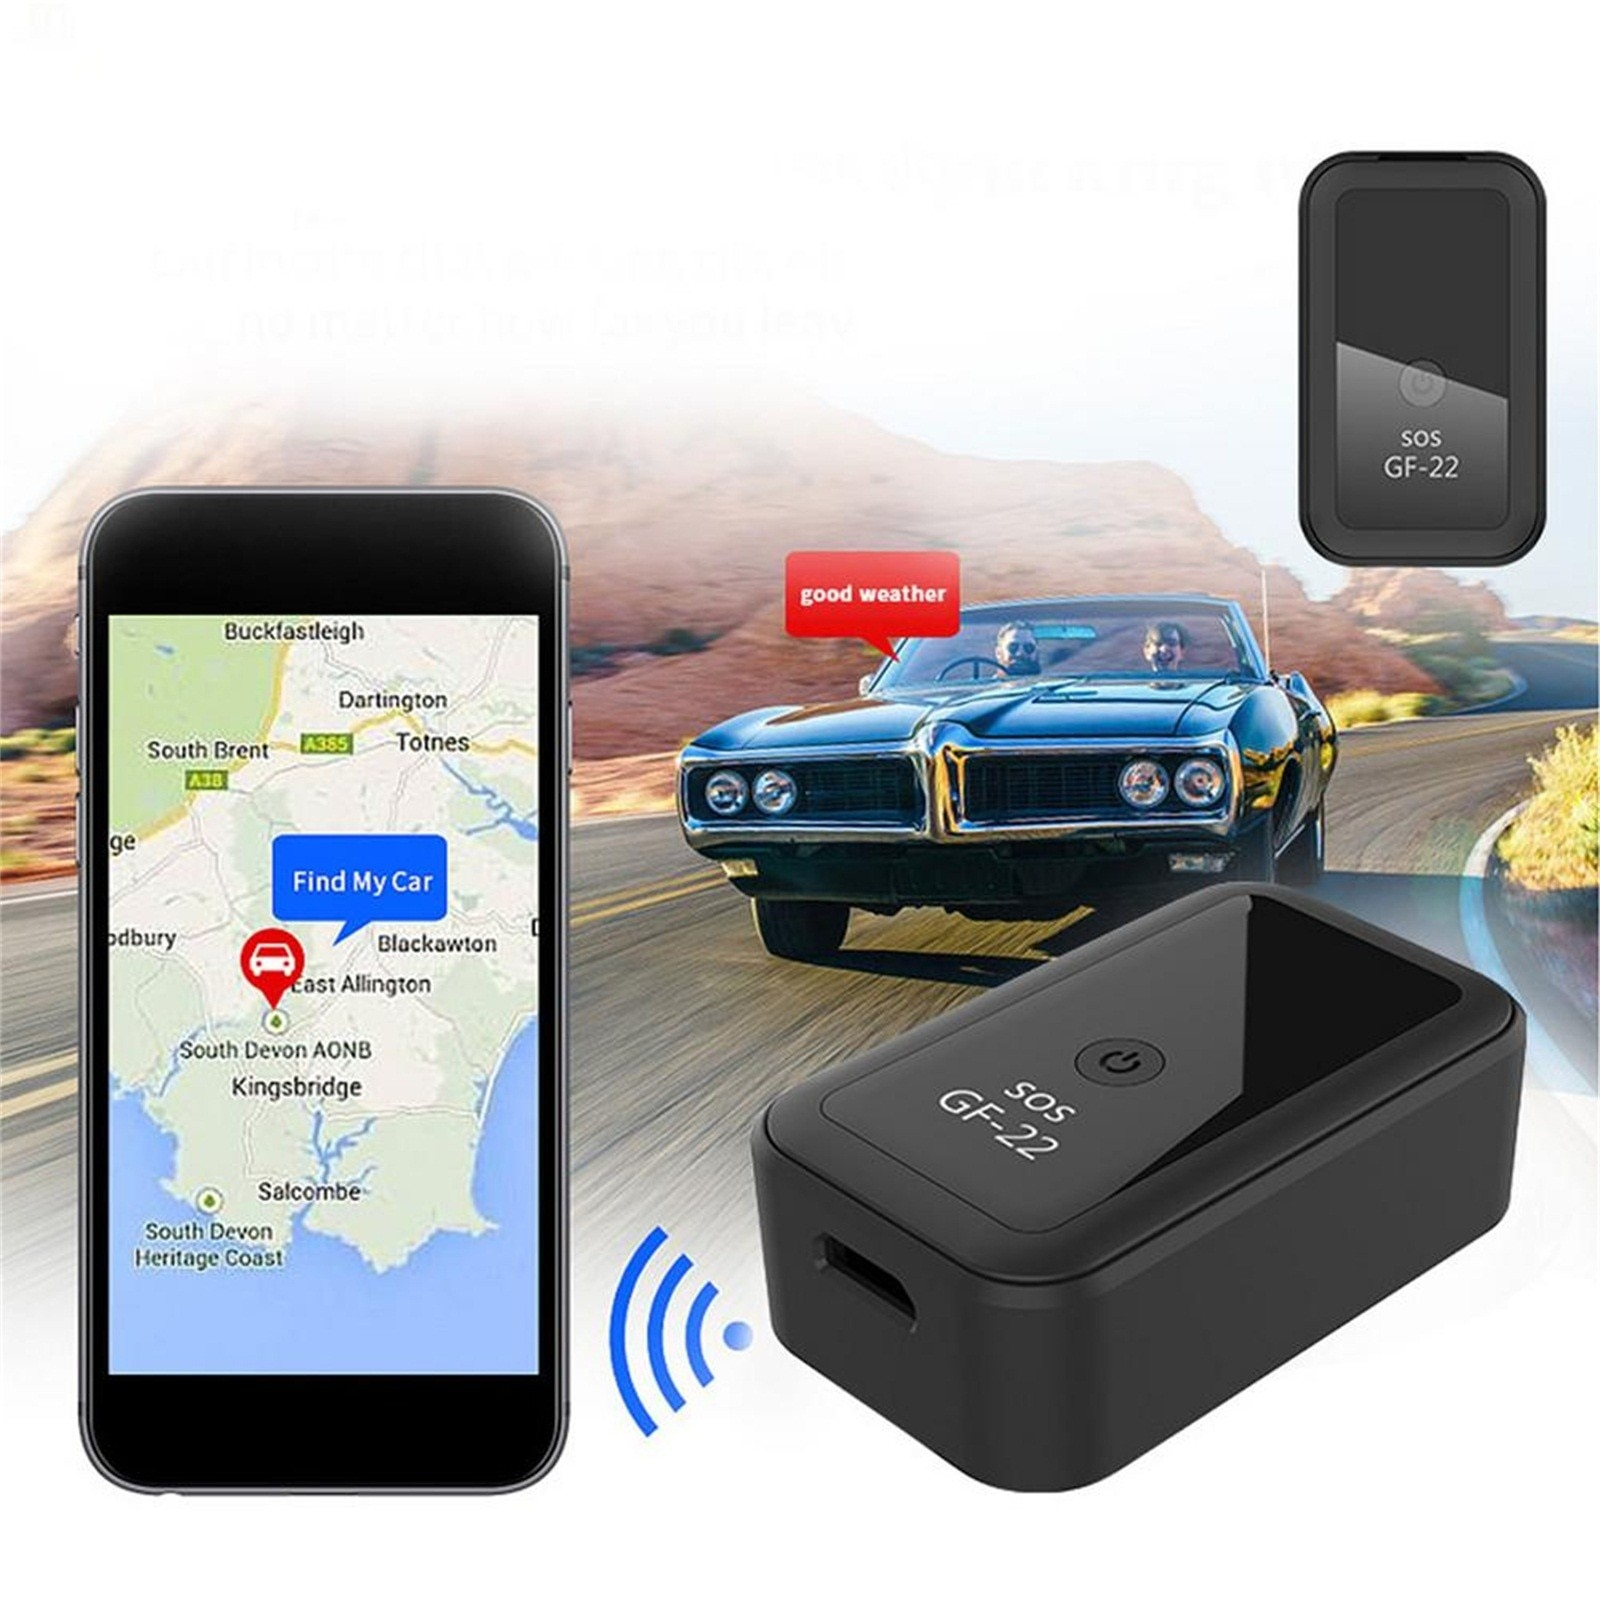 Gf22 carro de rastreamento anti-roubo dispositivo mini carro app em tempo real rastreamento gps localizador anti-perdido dispositivo de rastreamento de gravação gps localizador